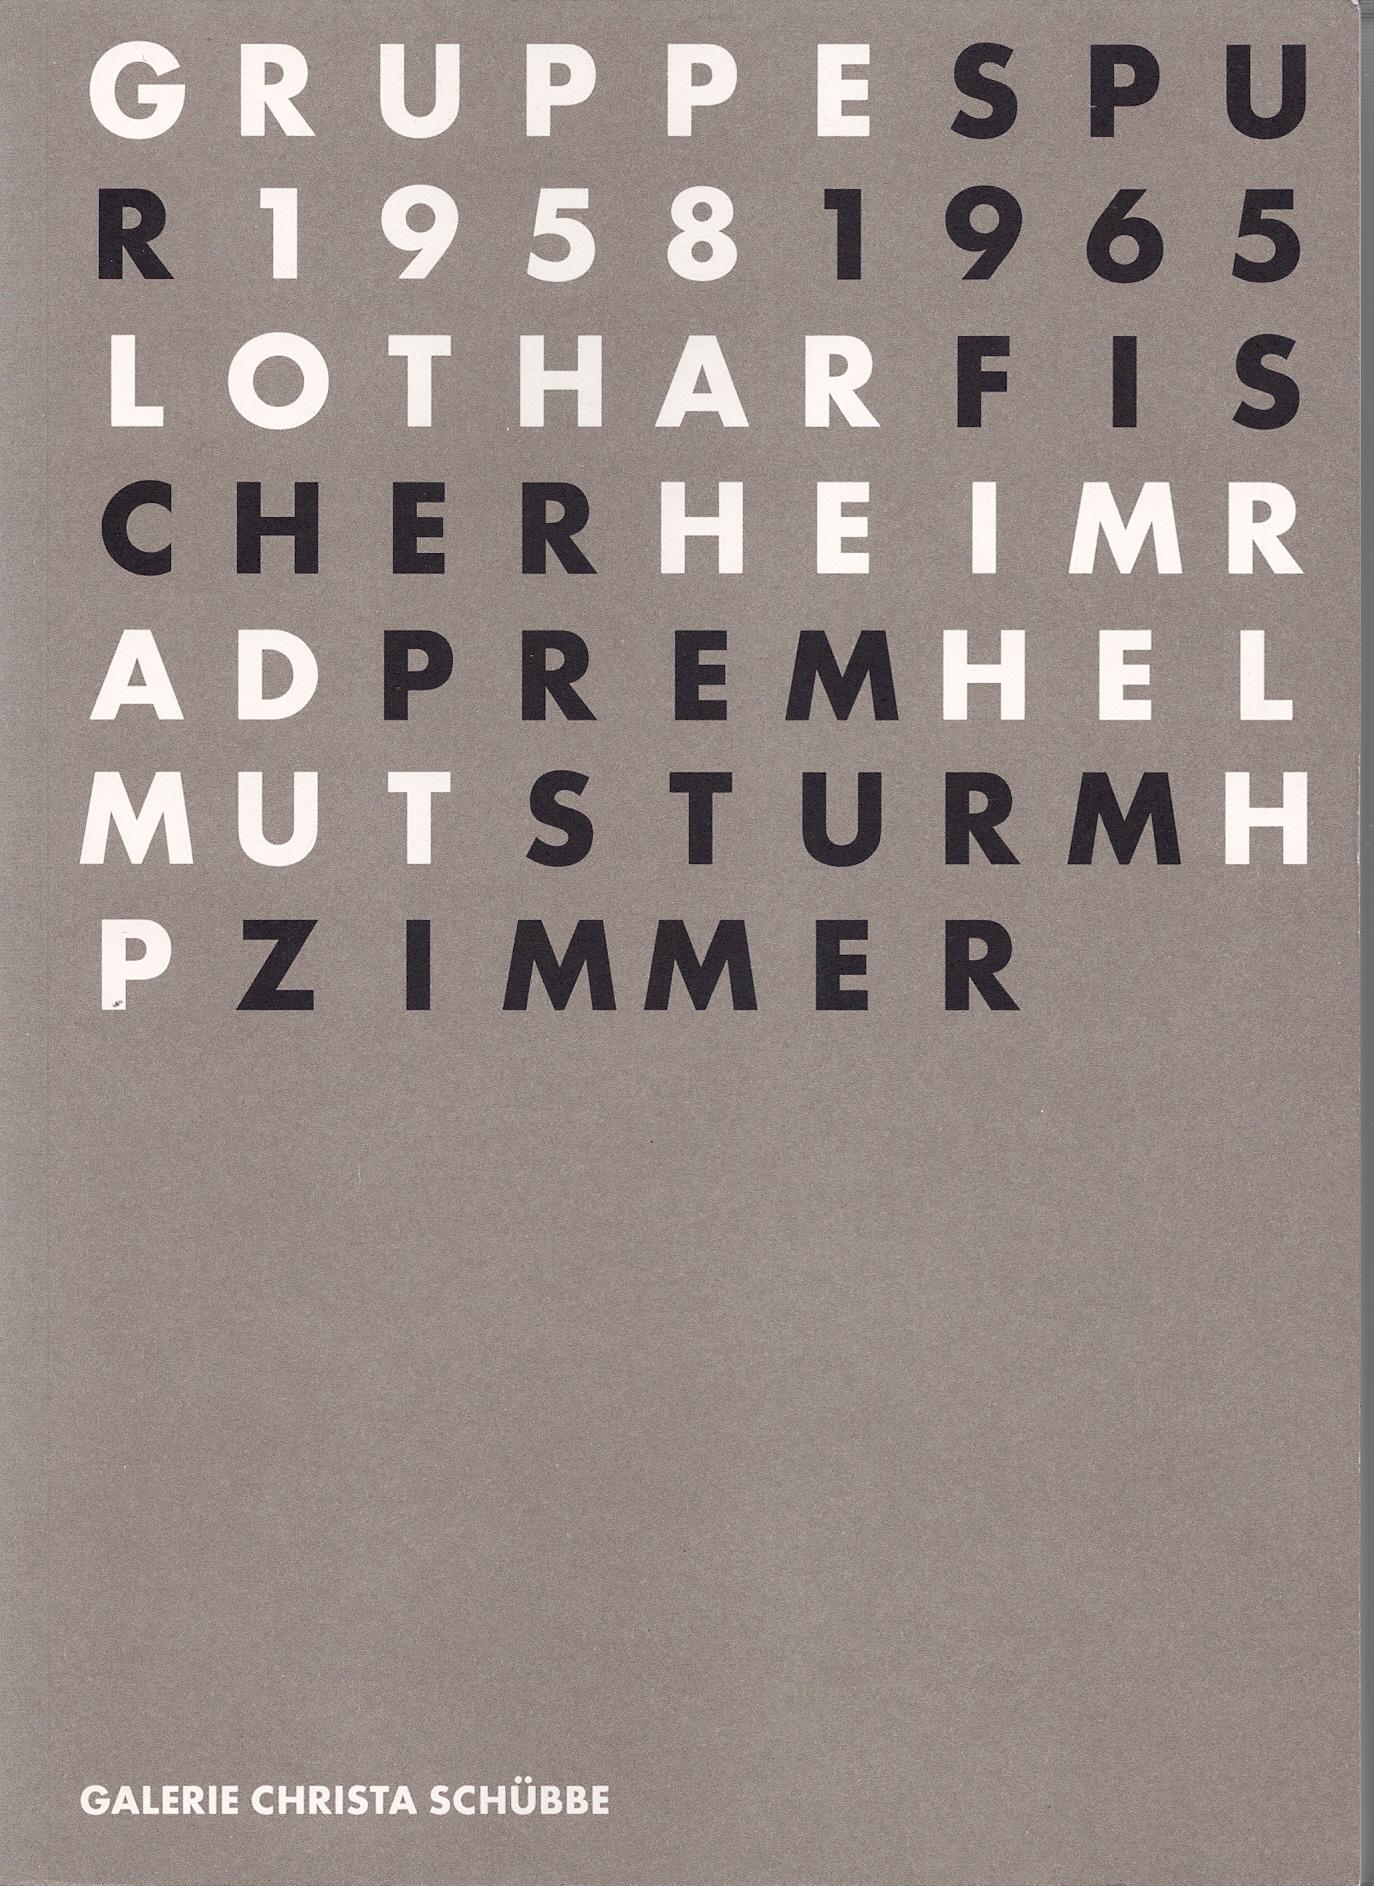 SPUR,  1985-1965, 2003